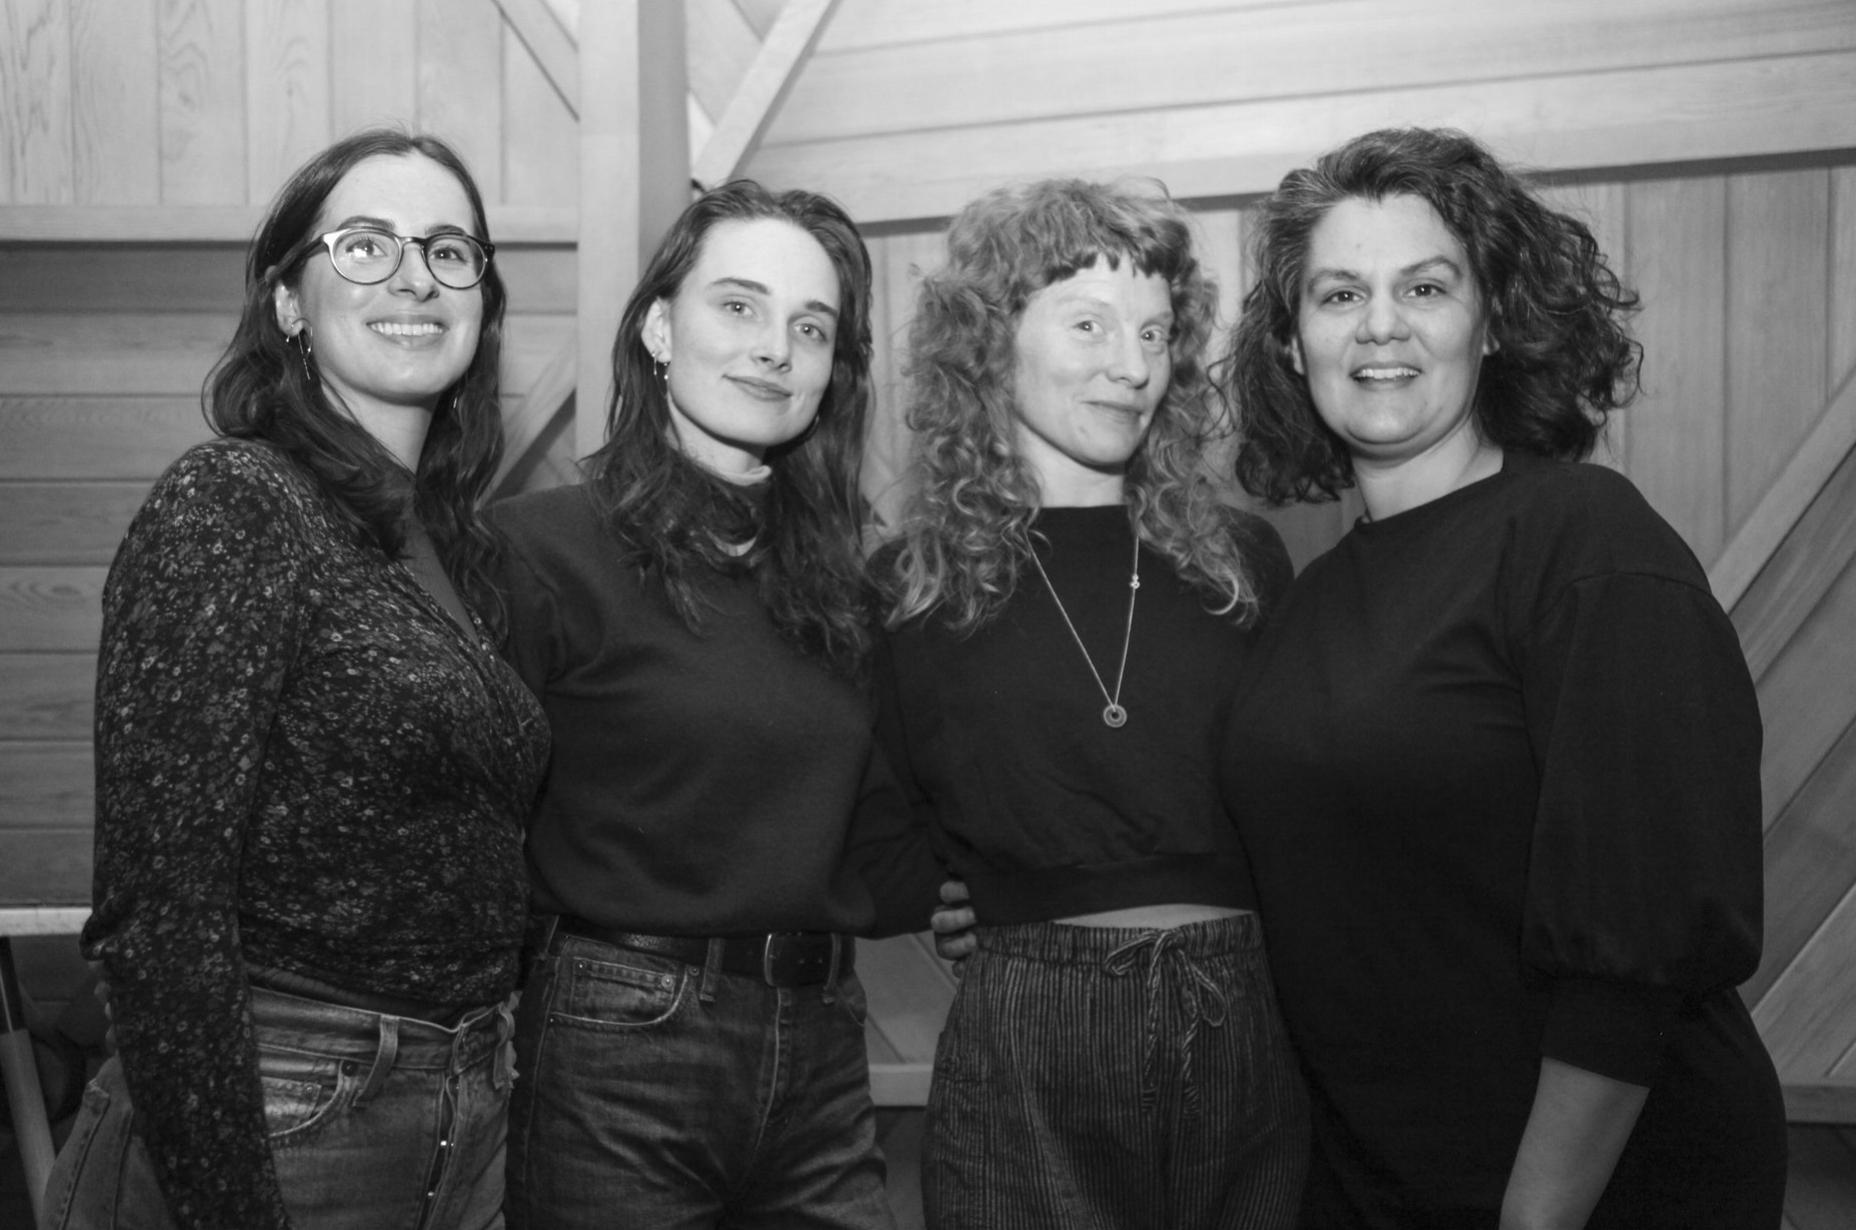 TERRA design team (l-r): Sarah Vitti, Jade Esplin, Tori Sparks, Valerie Farber